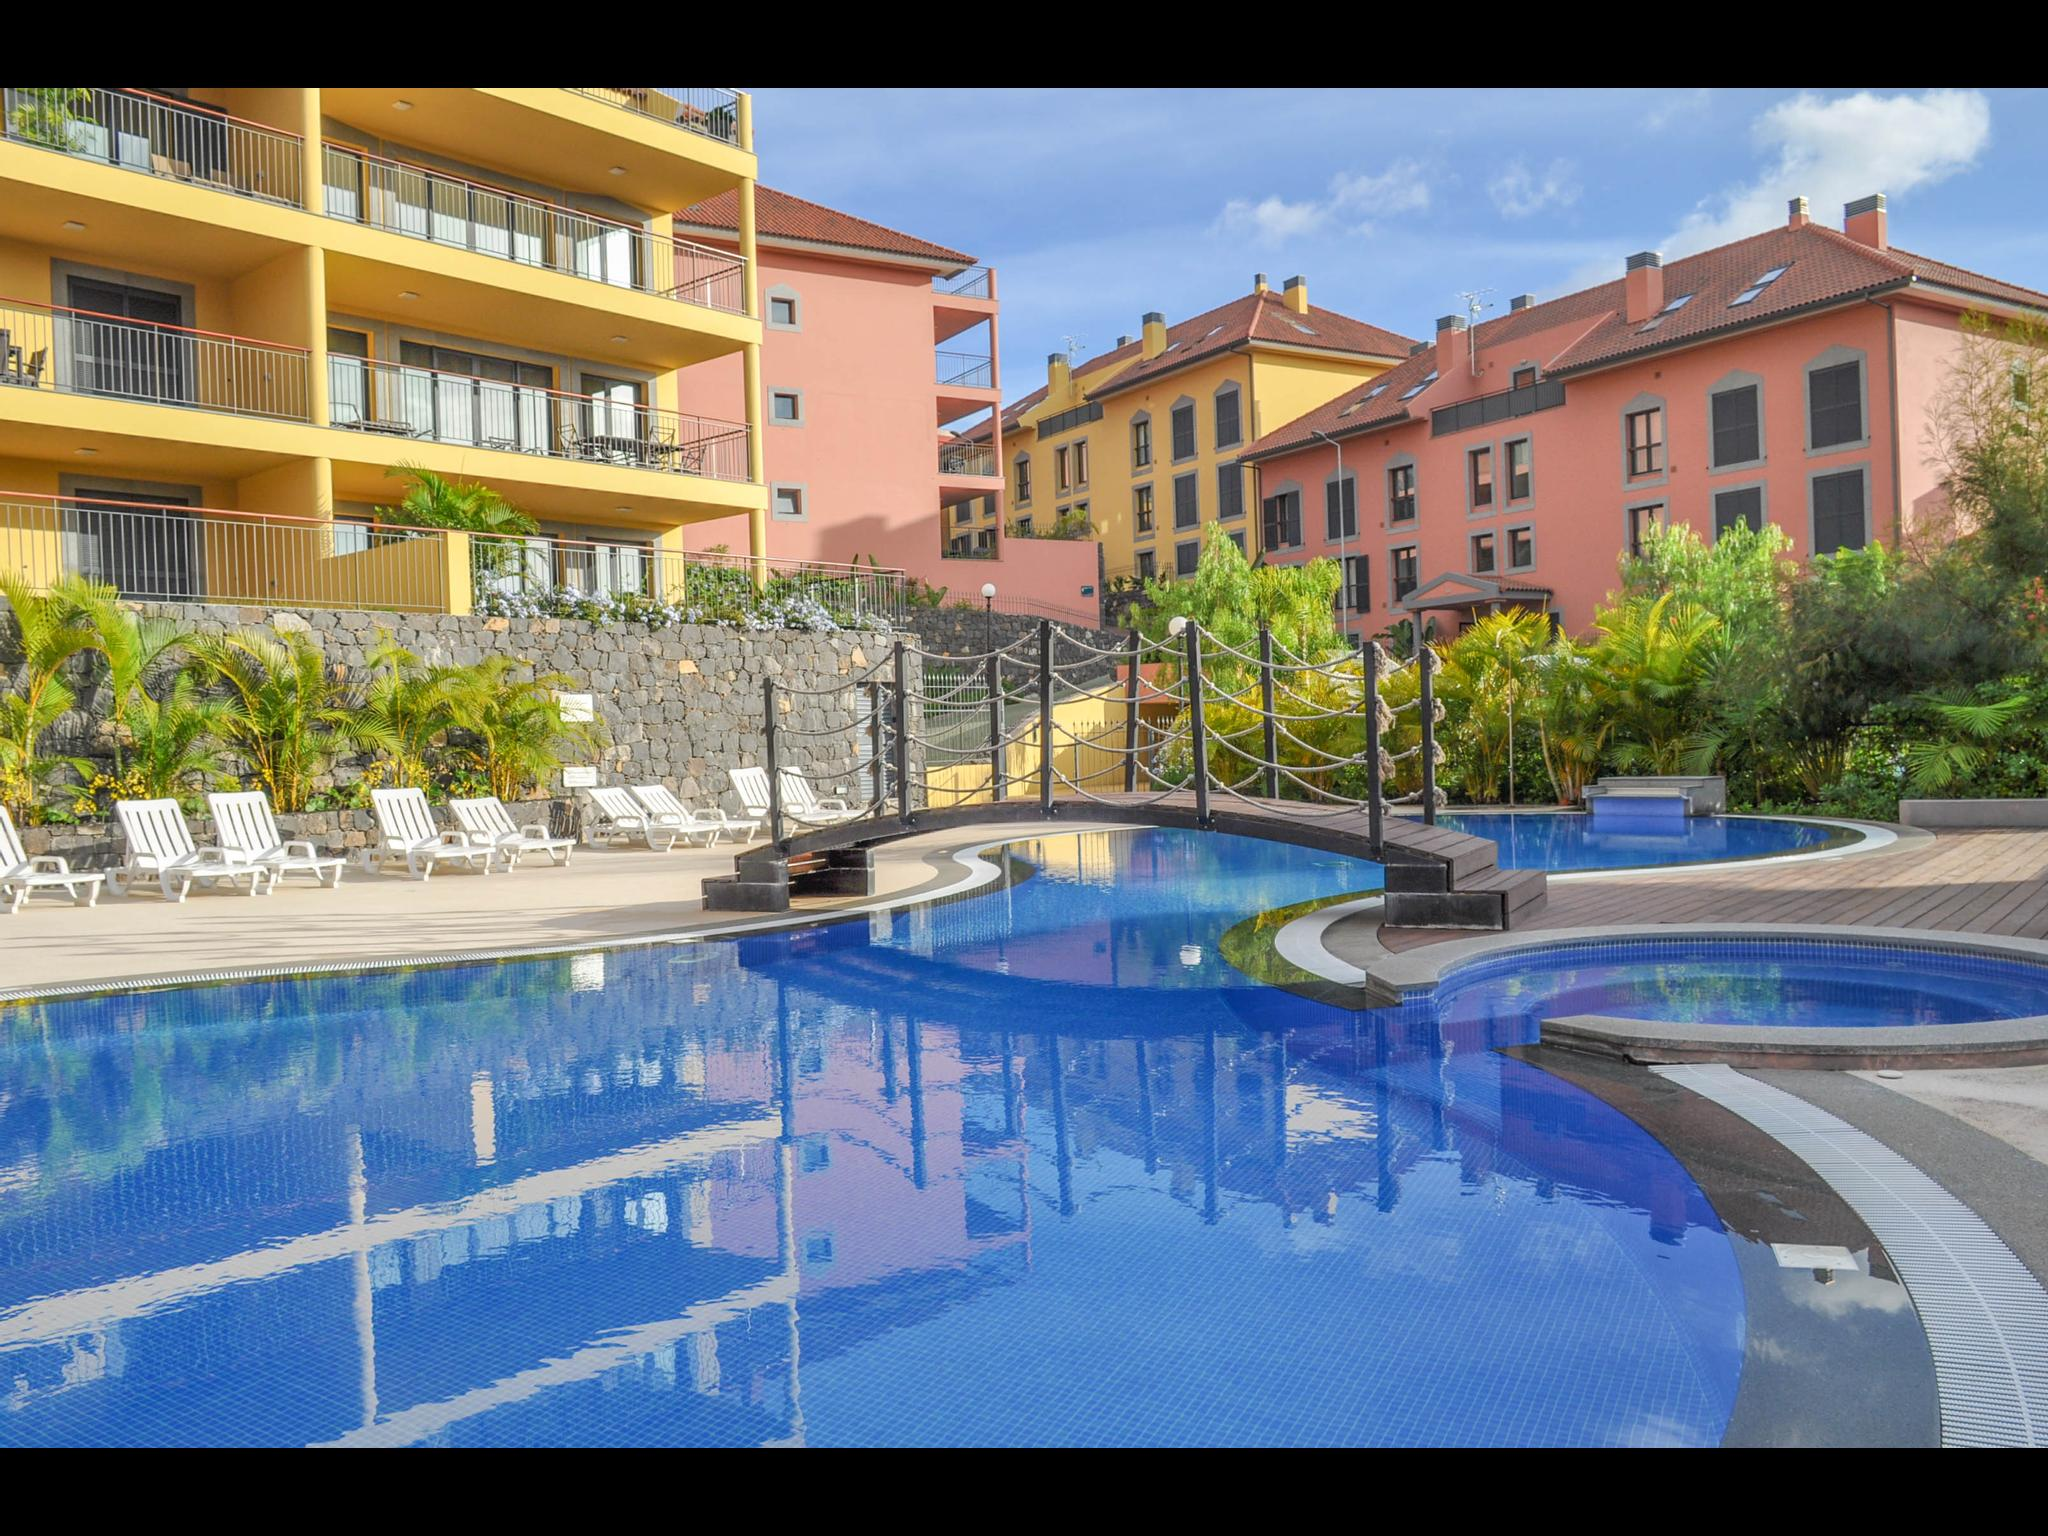 Vidal - Flat in a residential area in Funchal